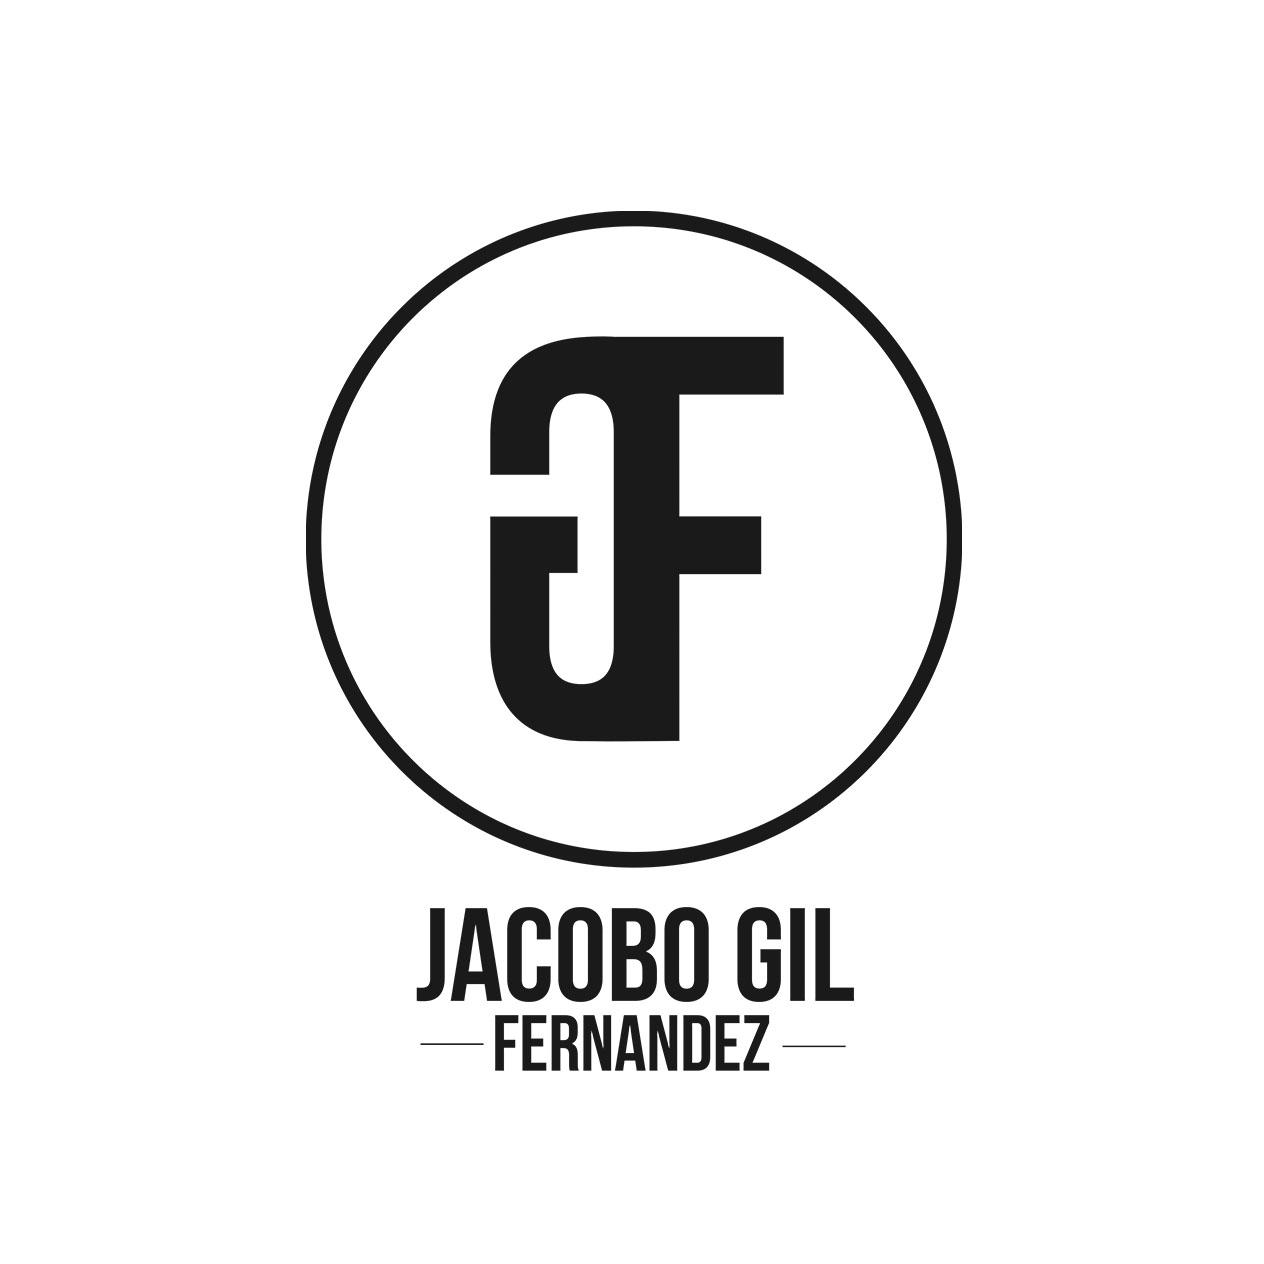 Jacobo Gil Fernandez